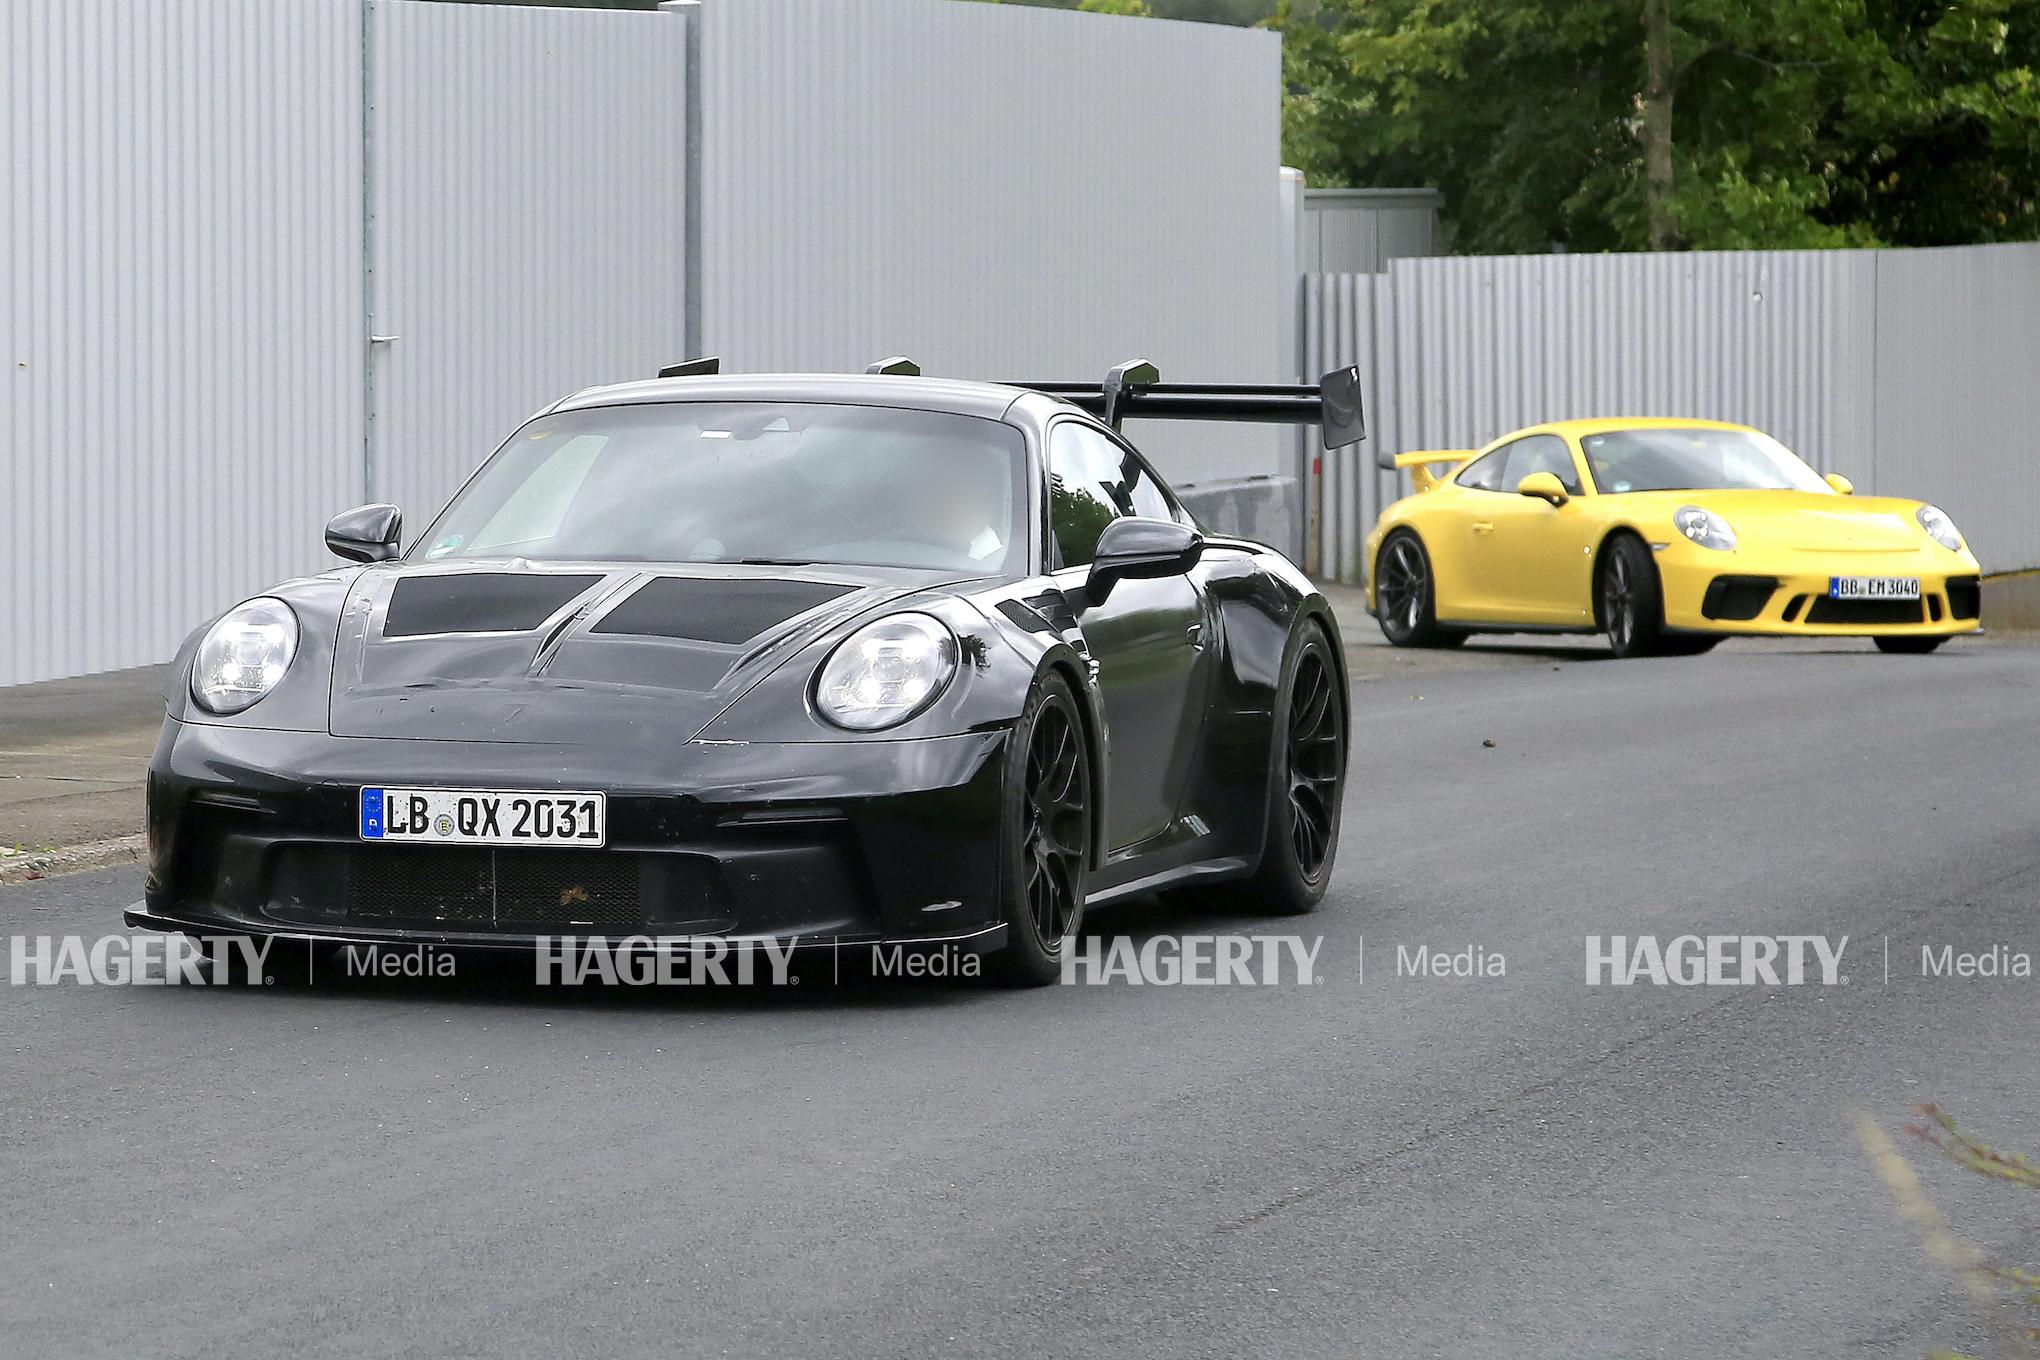 Porsche 911 GT3 RS front three-quarter test drive action trailing yellow porsche